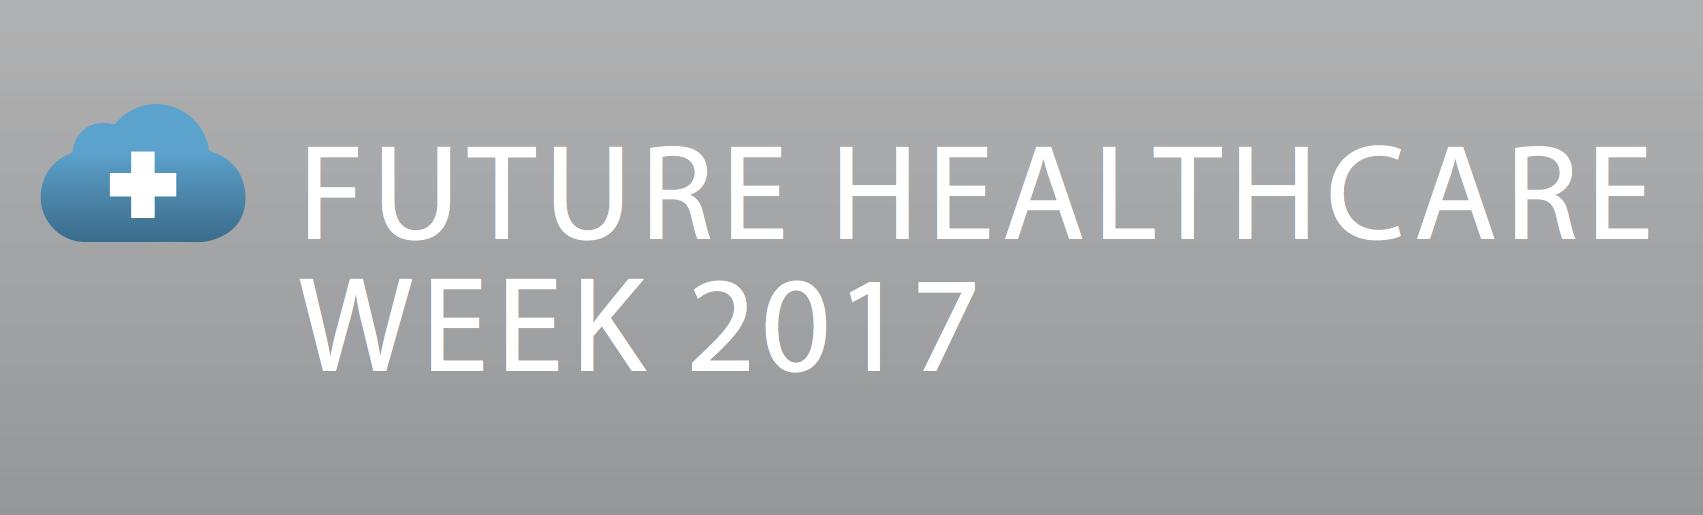 Future Healthcare Week.png